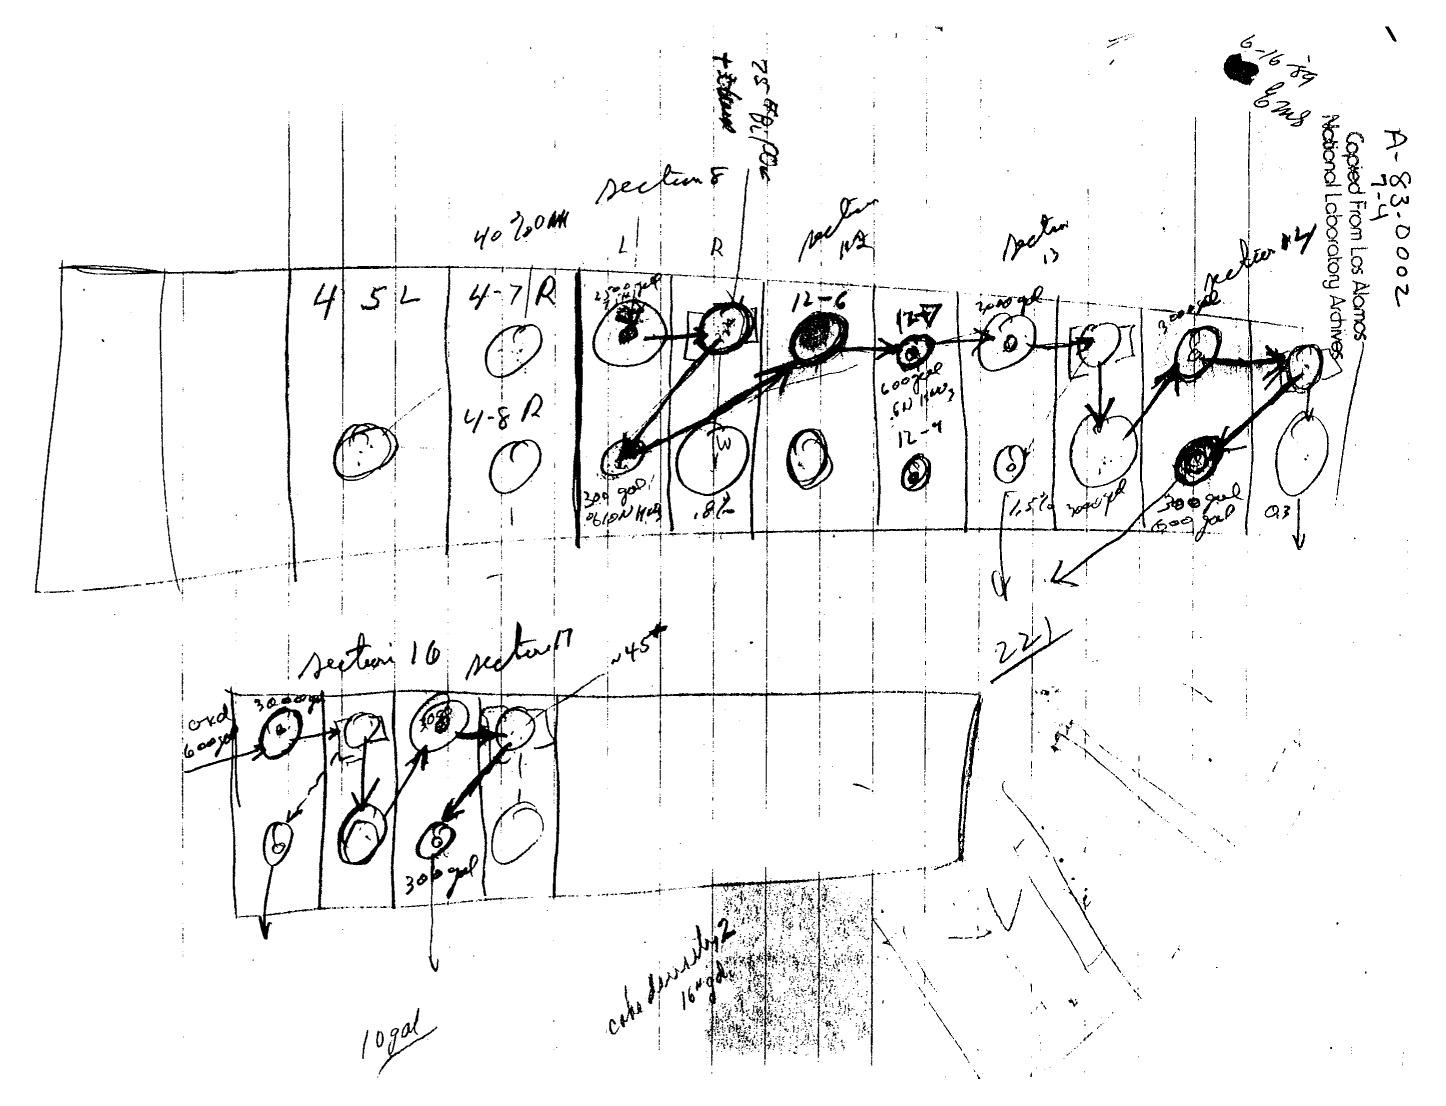 hight resolution of 1100x841 component ac power supply circuit high current transformerless 1446x1106 feynman s diagrammatic sketch of storage of barrels of uranium